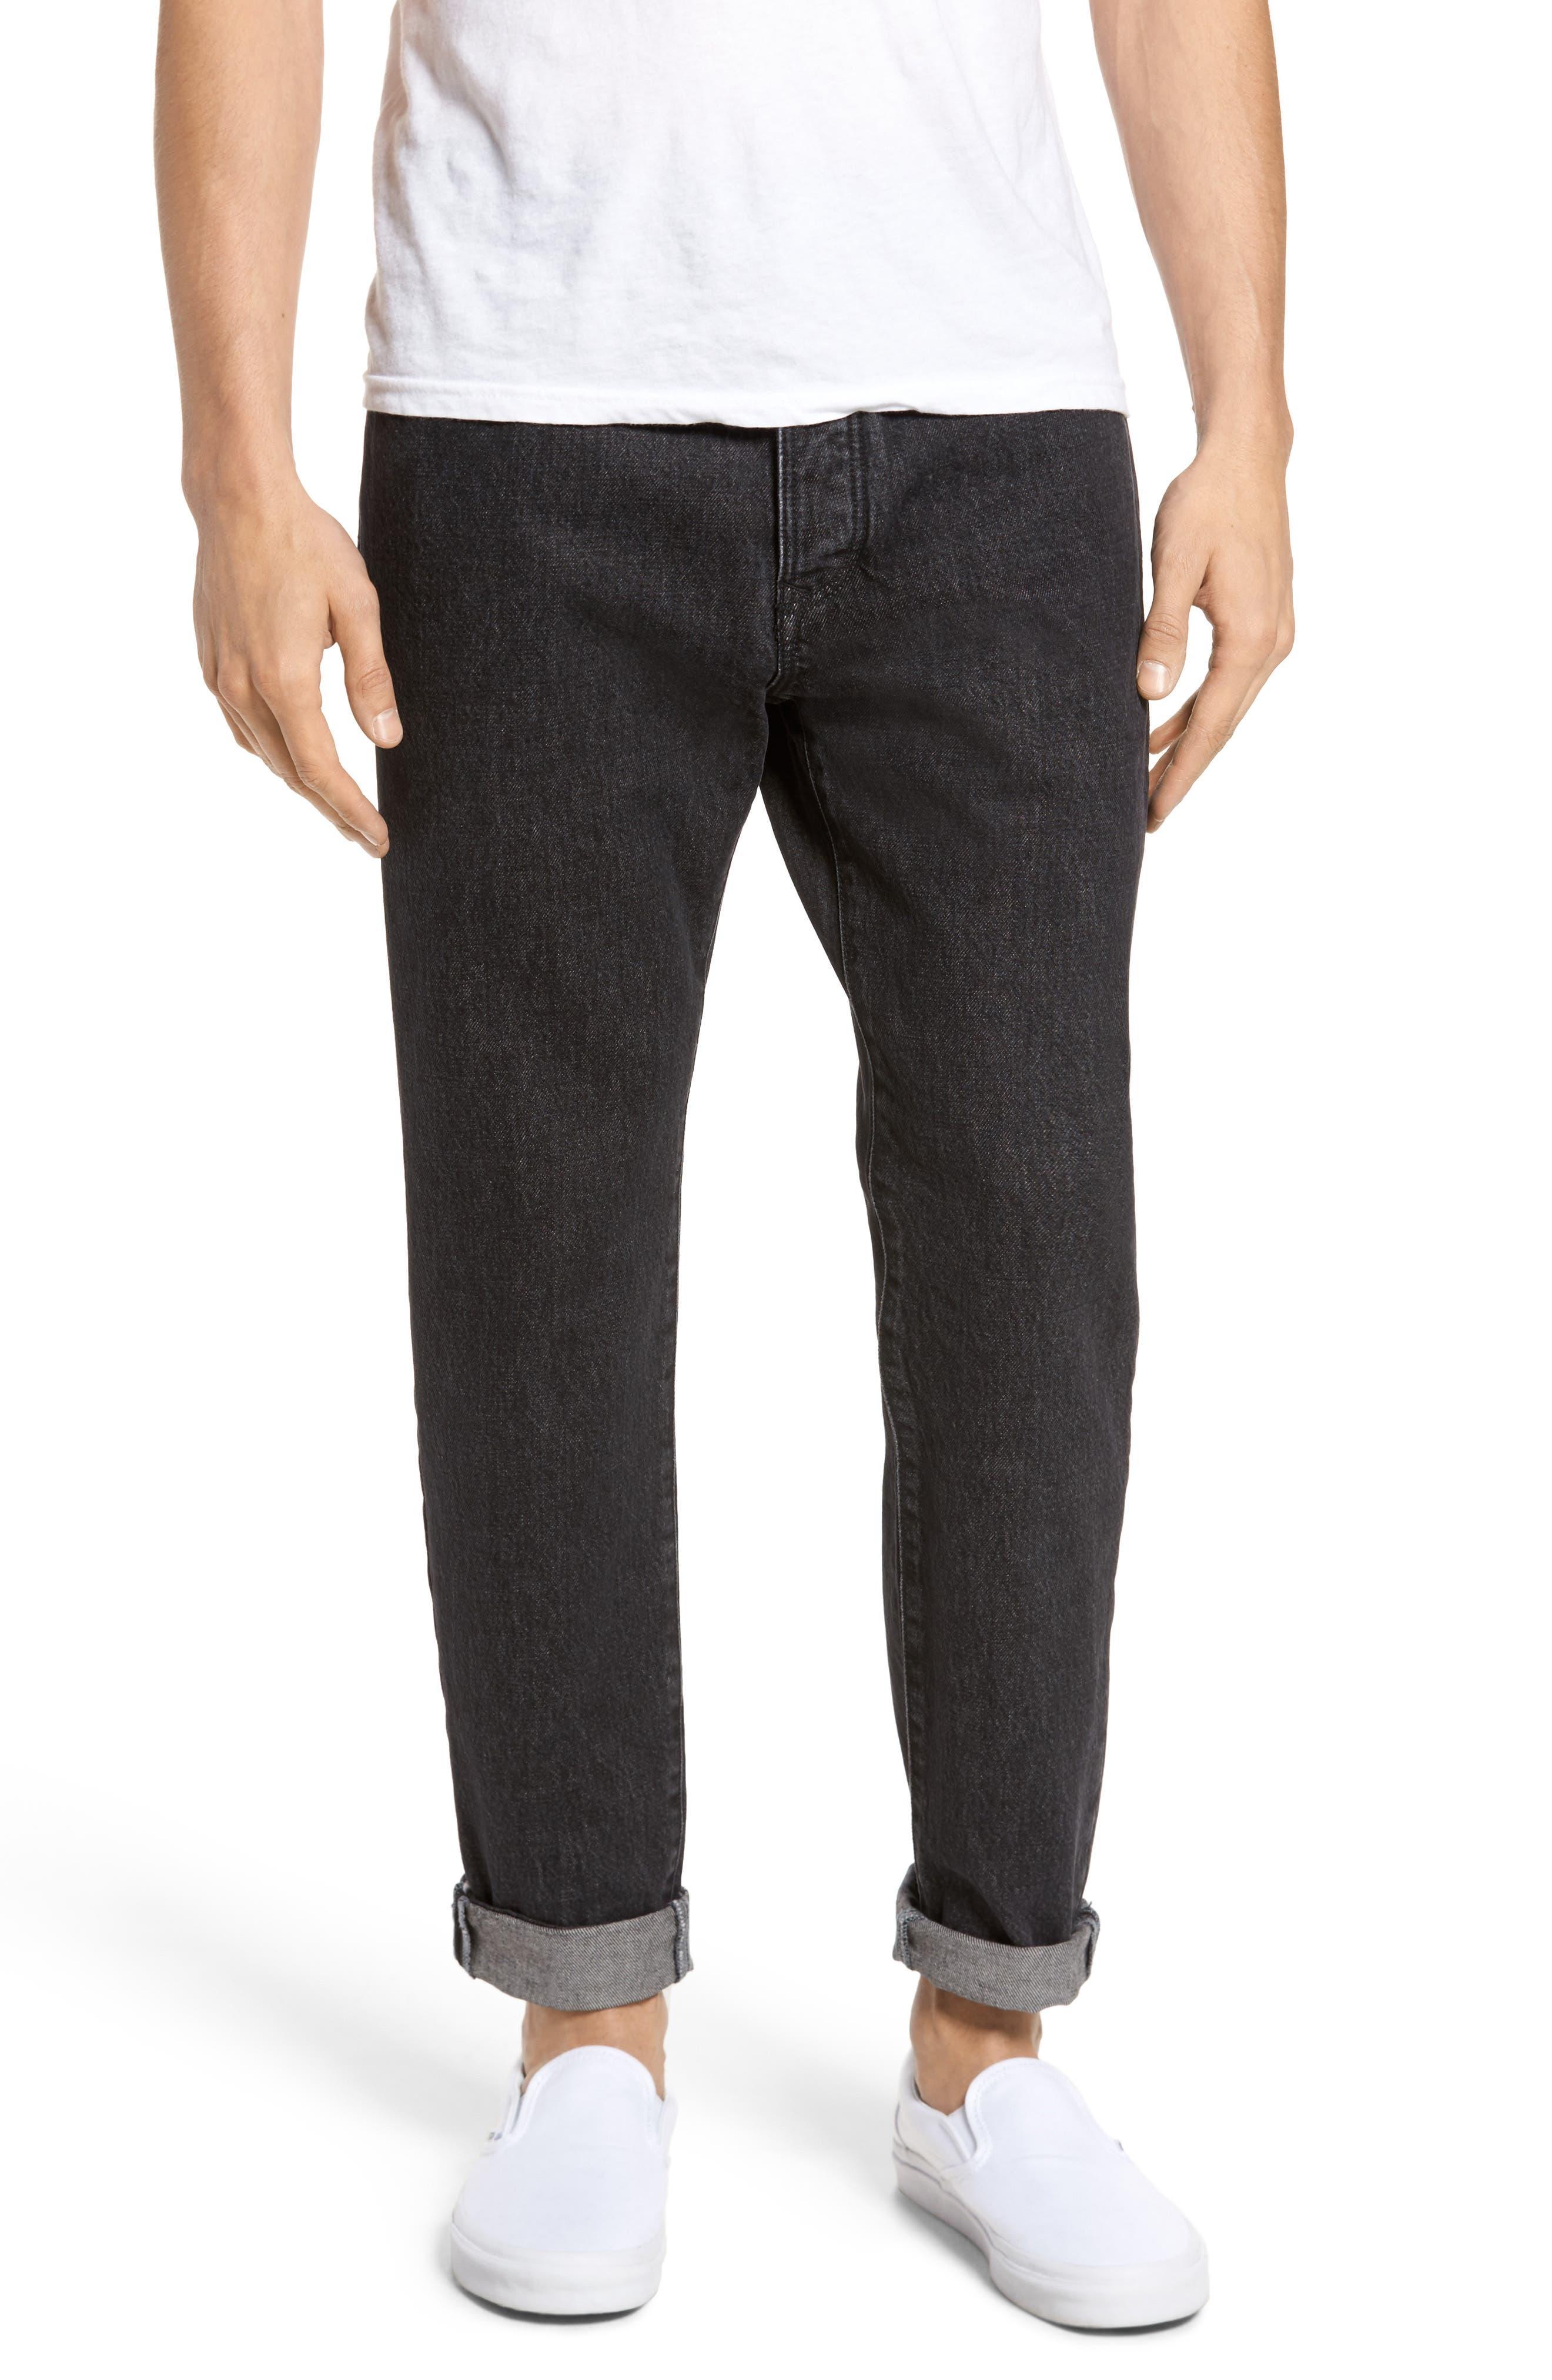 90s Classic Straight Leg Jeans,                         Main,                         color, Black